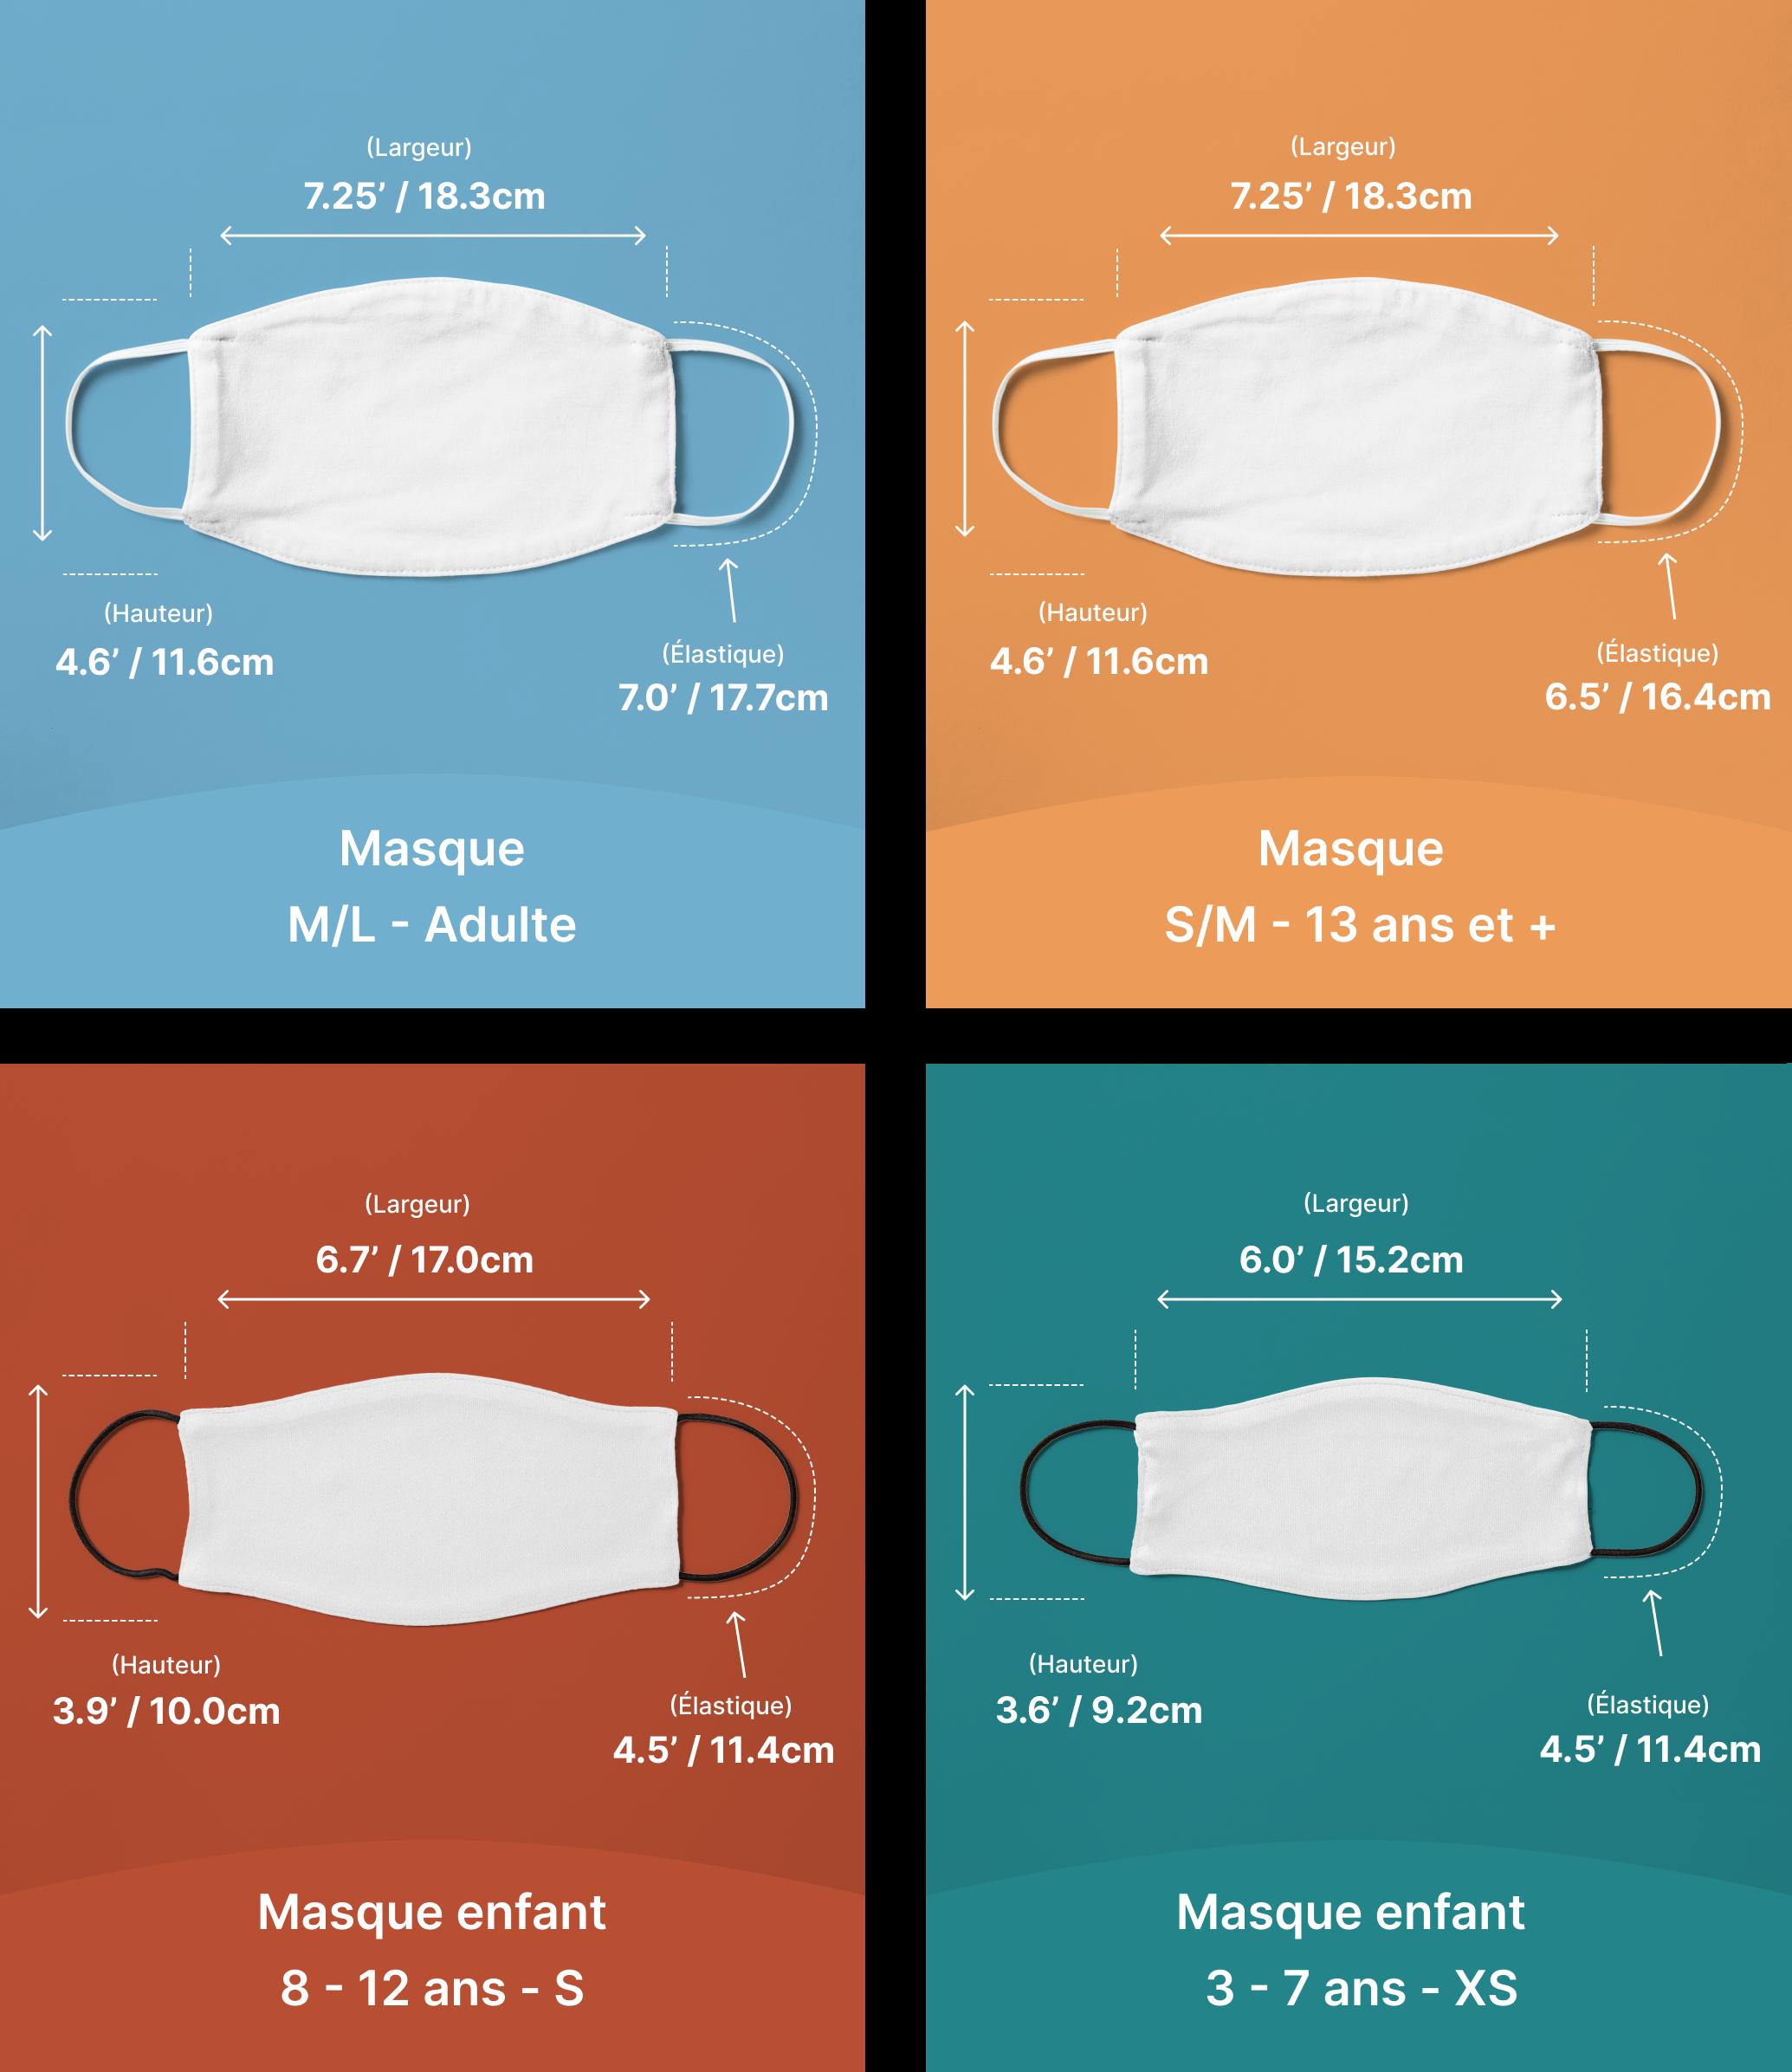 flat-mask-size_en-us.png